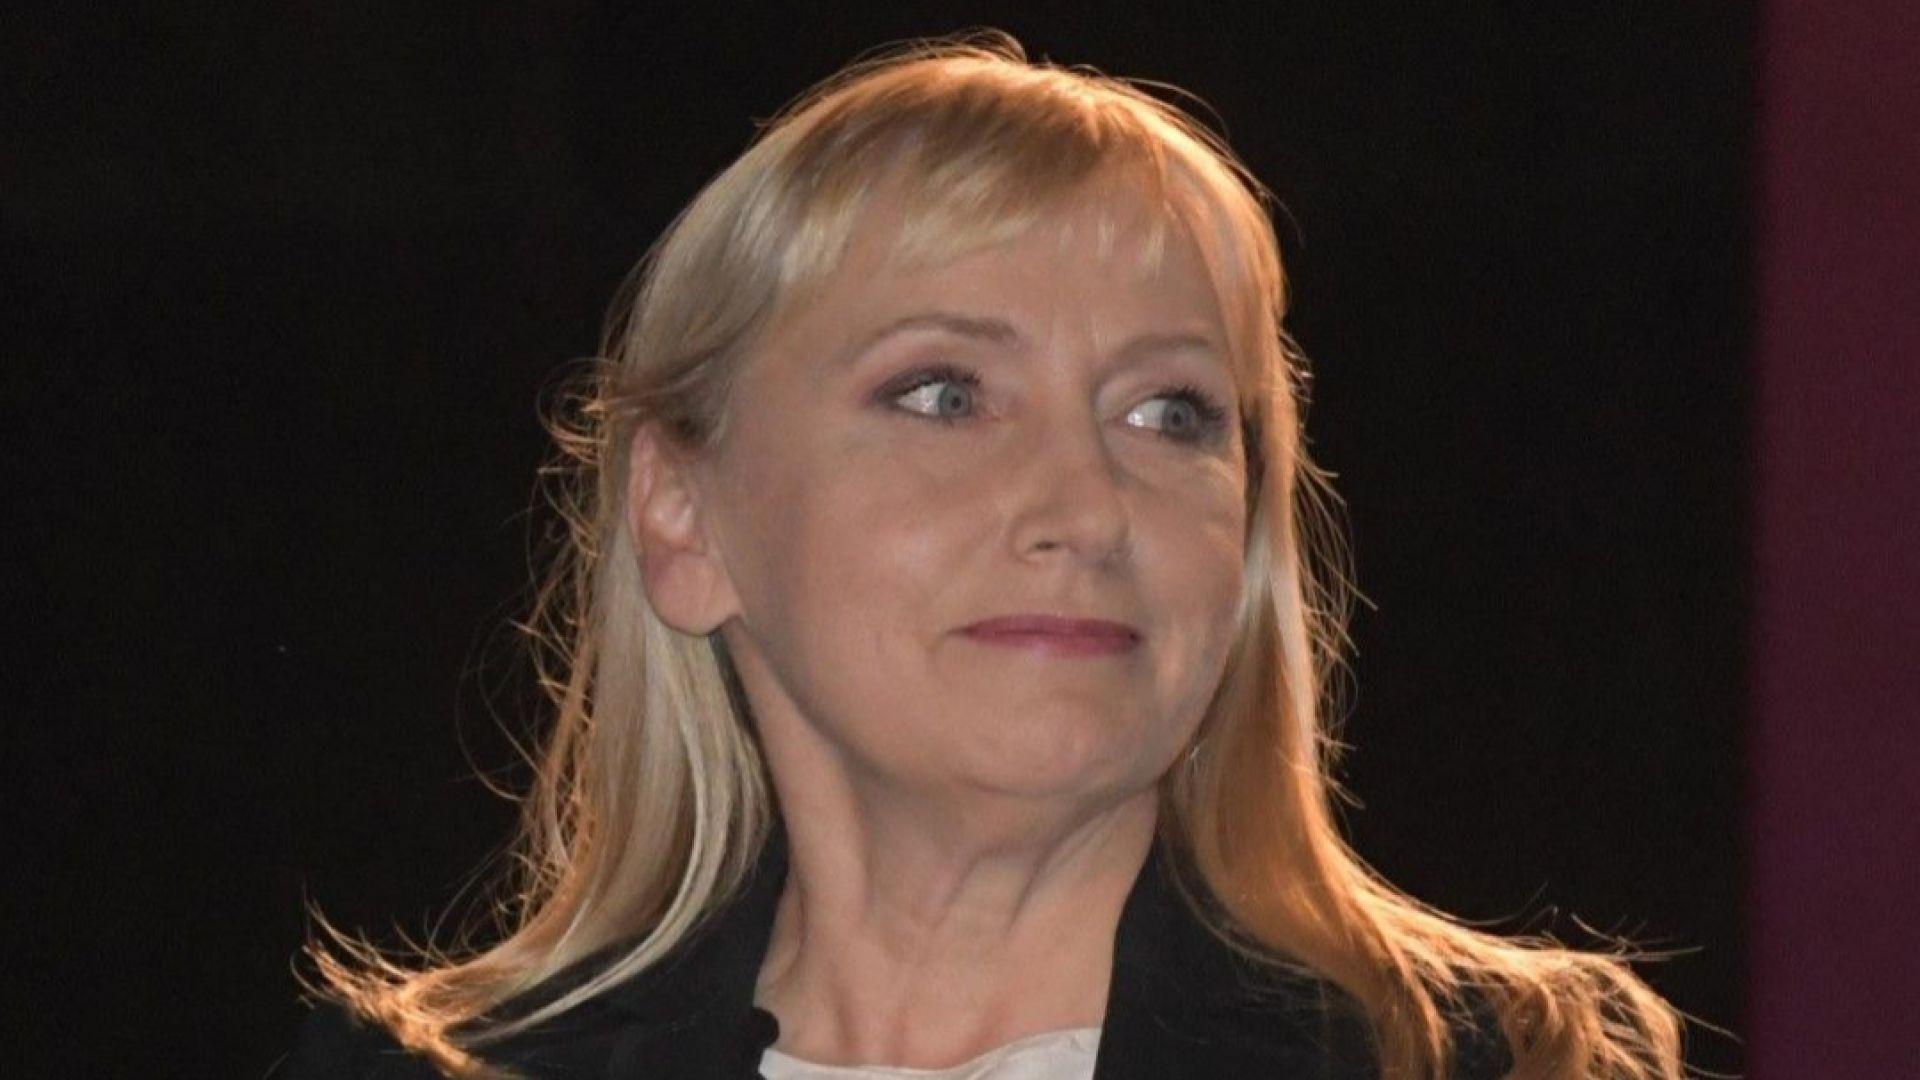 Елена Йончева: Нинова не подкрепя президента заради договорка с Бойко Борисов